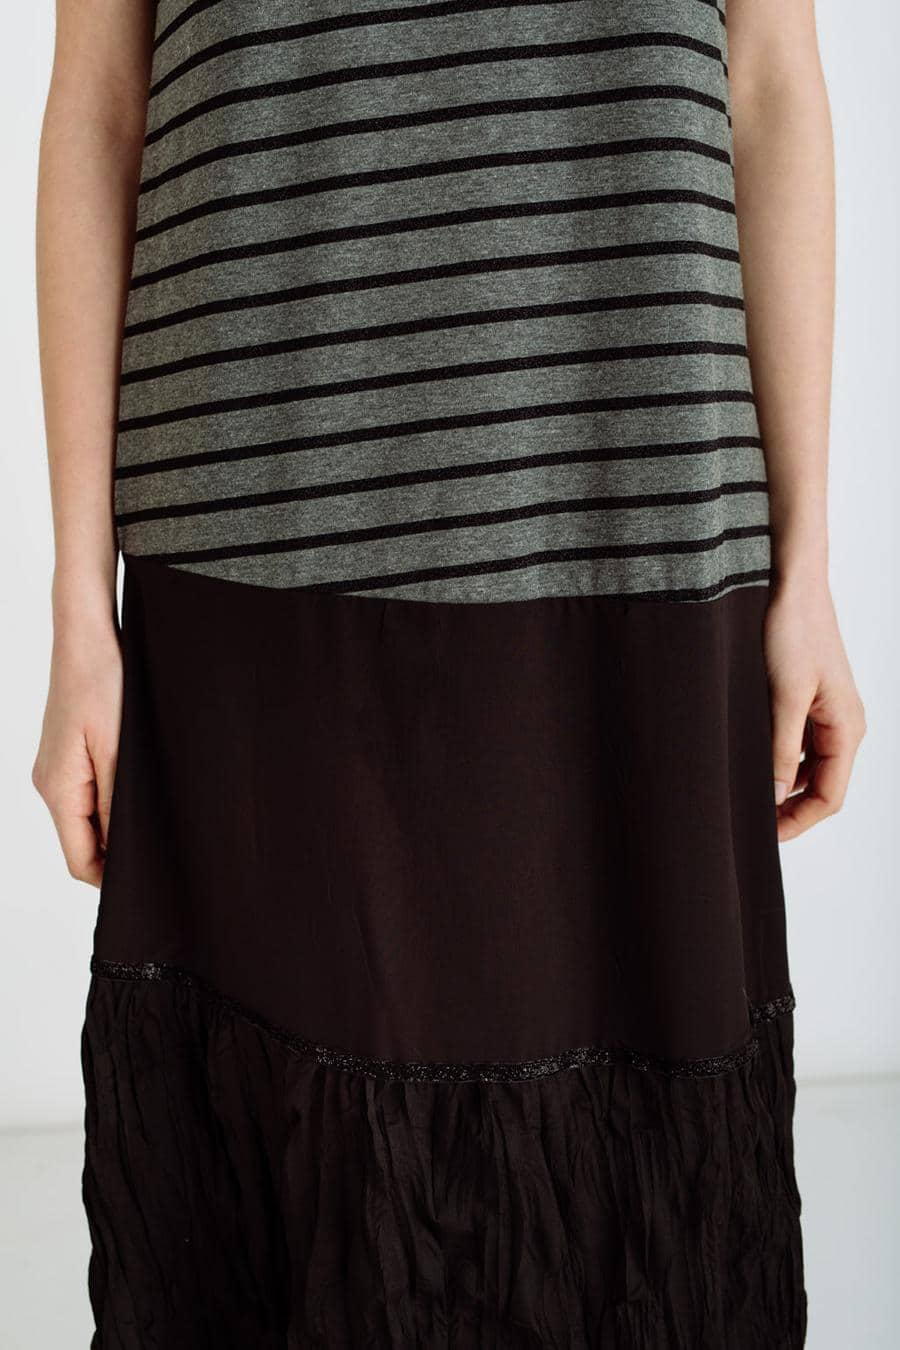 jagger zenska haljina kolekcija prolece leto ss2021 kupi online jg 5497 01 5